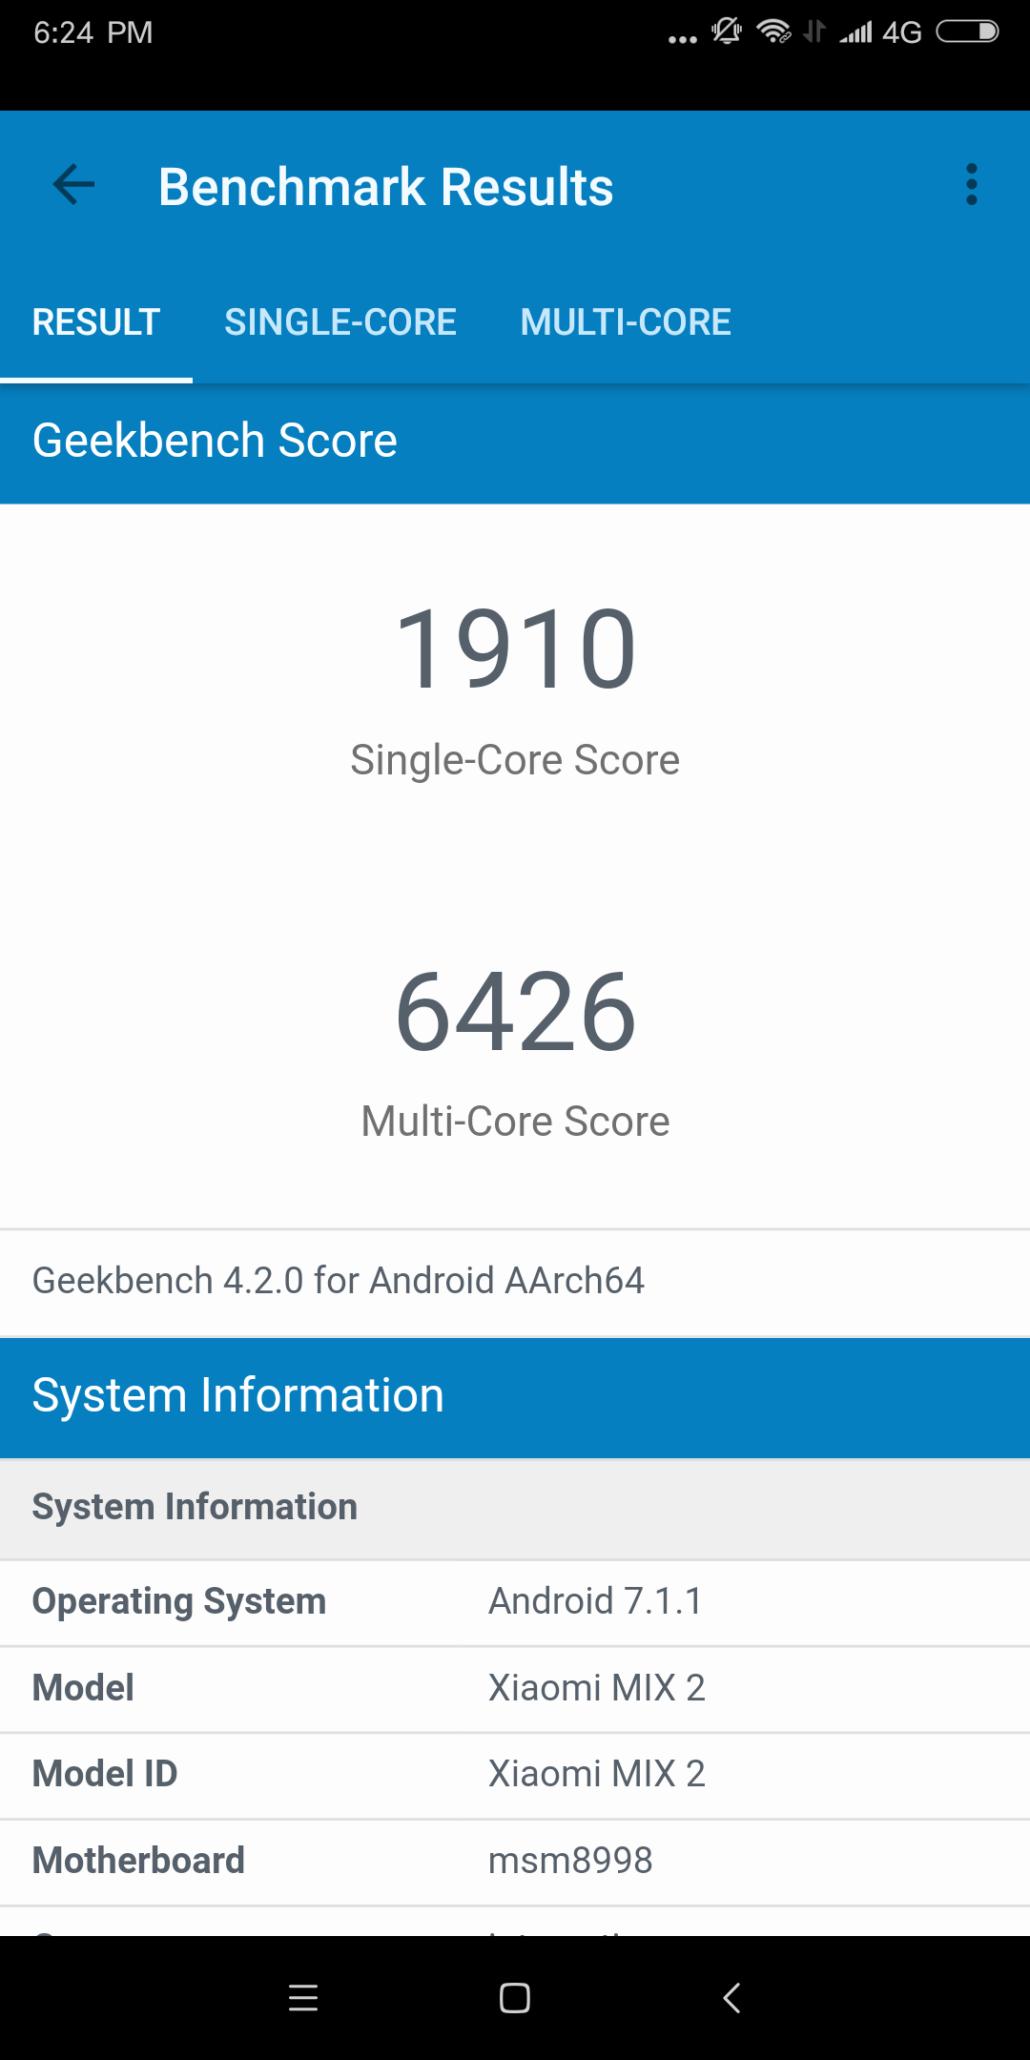 screenshot_2018-01-28-18-24-47-892_com-primatelabs-geekbench